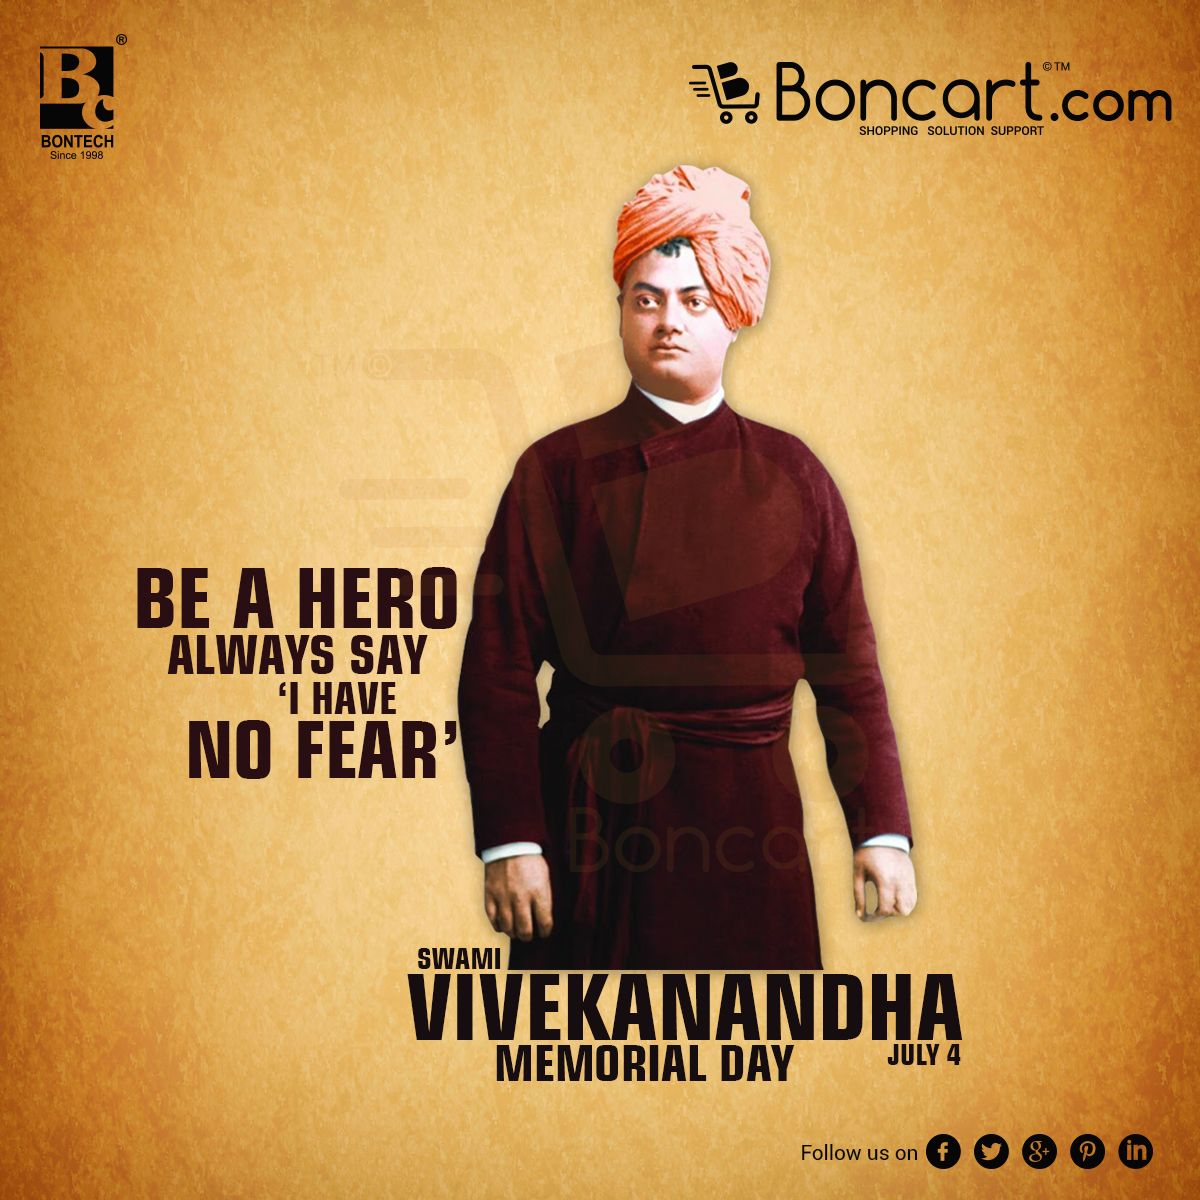 Swami Vivekanandha Memorial Day July 4 Be A Hero Always Say I Have No Fear Memorial Day Memories Hero